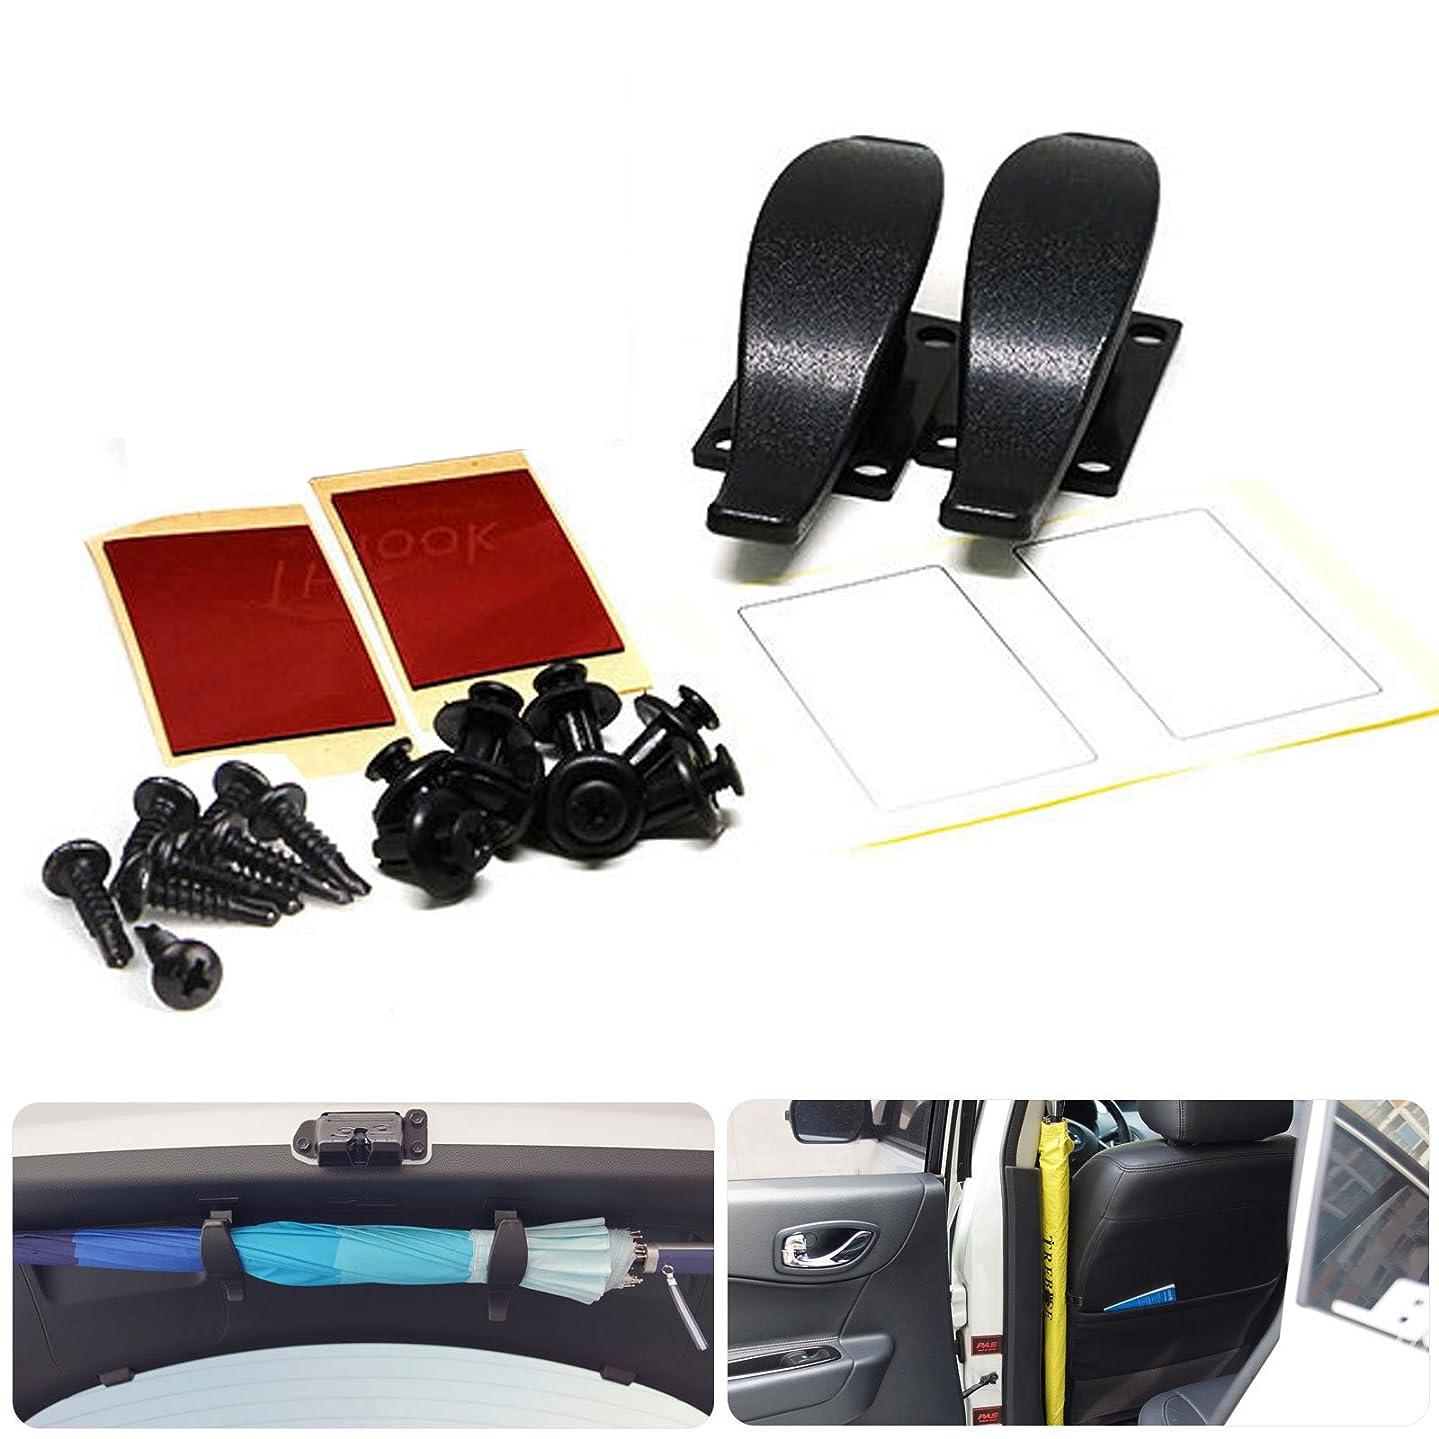 Lifetech Car Automotive Multi Purpose Universal Trunk Lid Umbrella Golf Club Stick Holder Hanger for Truck Suv Auto Car Vehicle Black